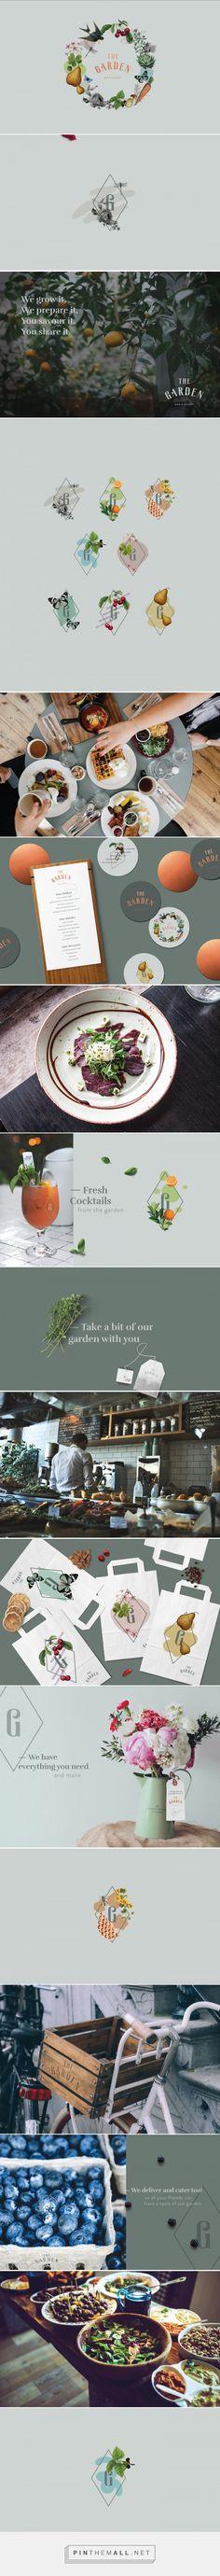 The Garden Restaurant Branding by Constanca Soromenho | Fivestar Branding Agency – Design and Branding Agency & Curated Inspiration Gallery